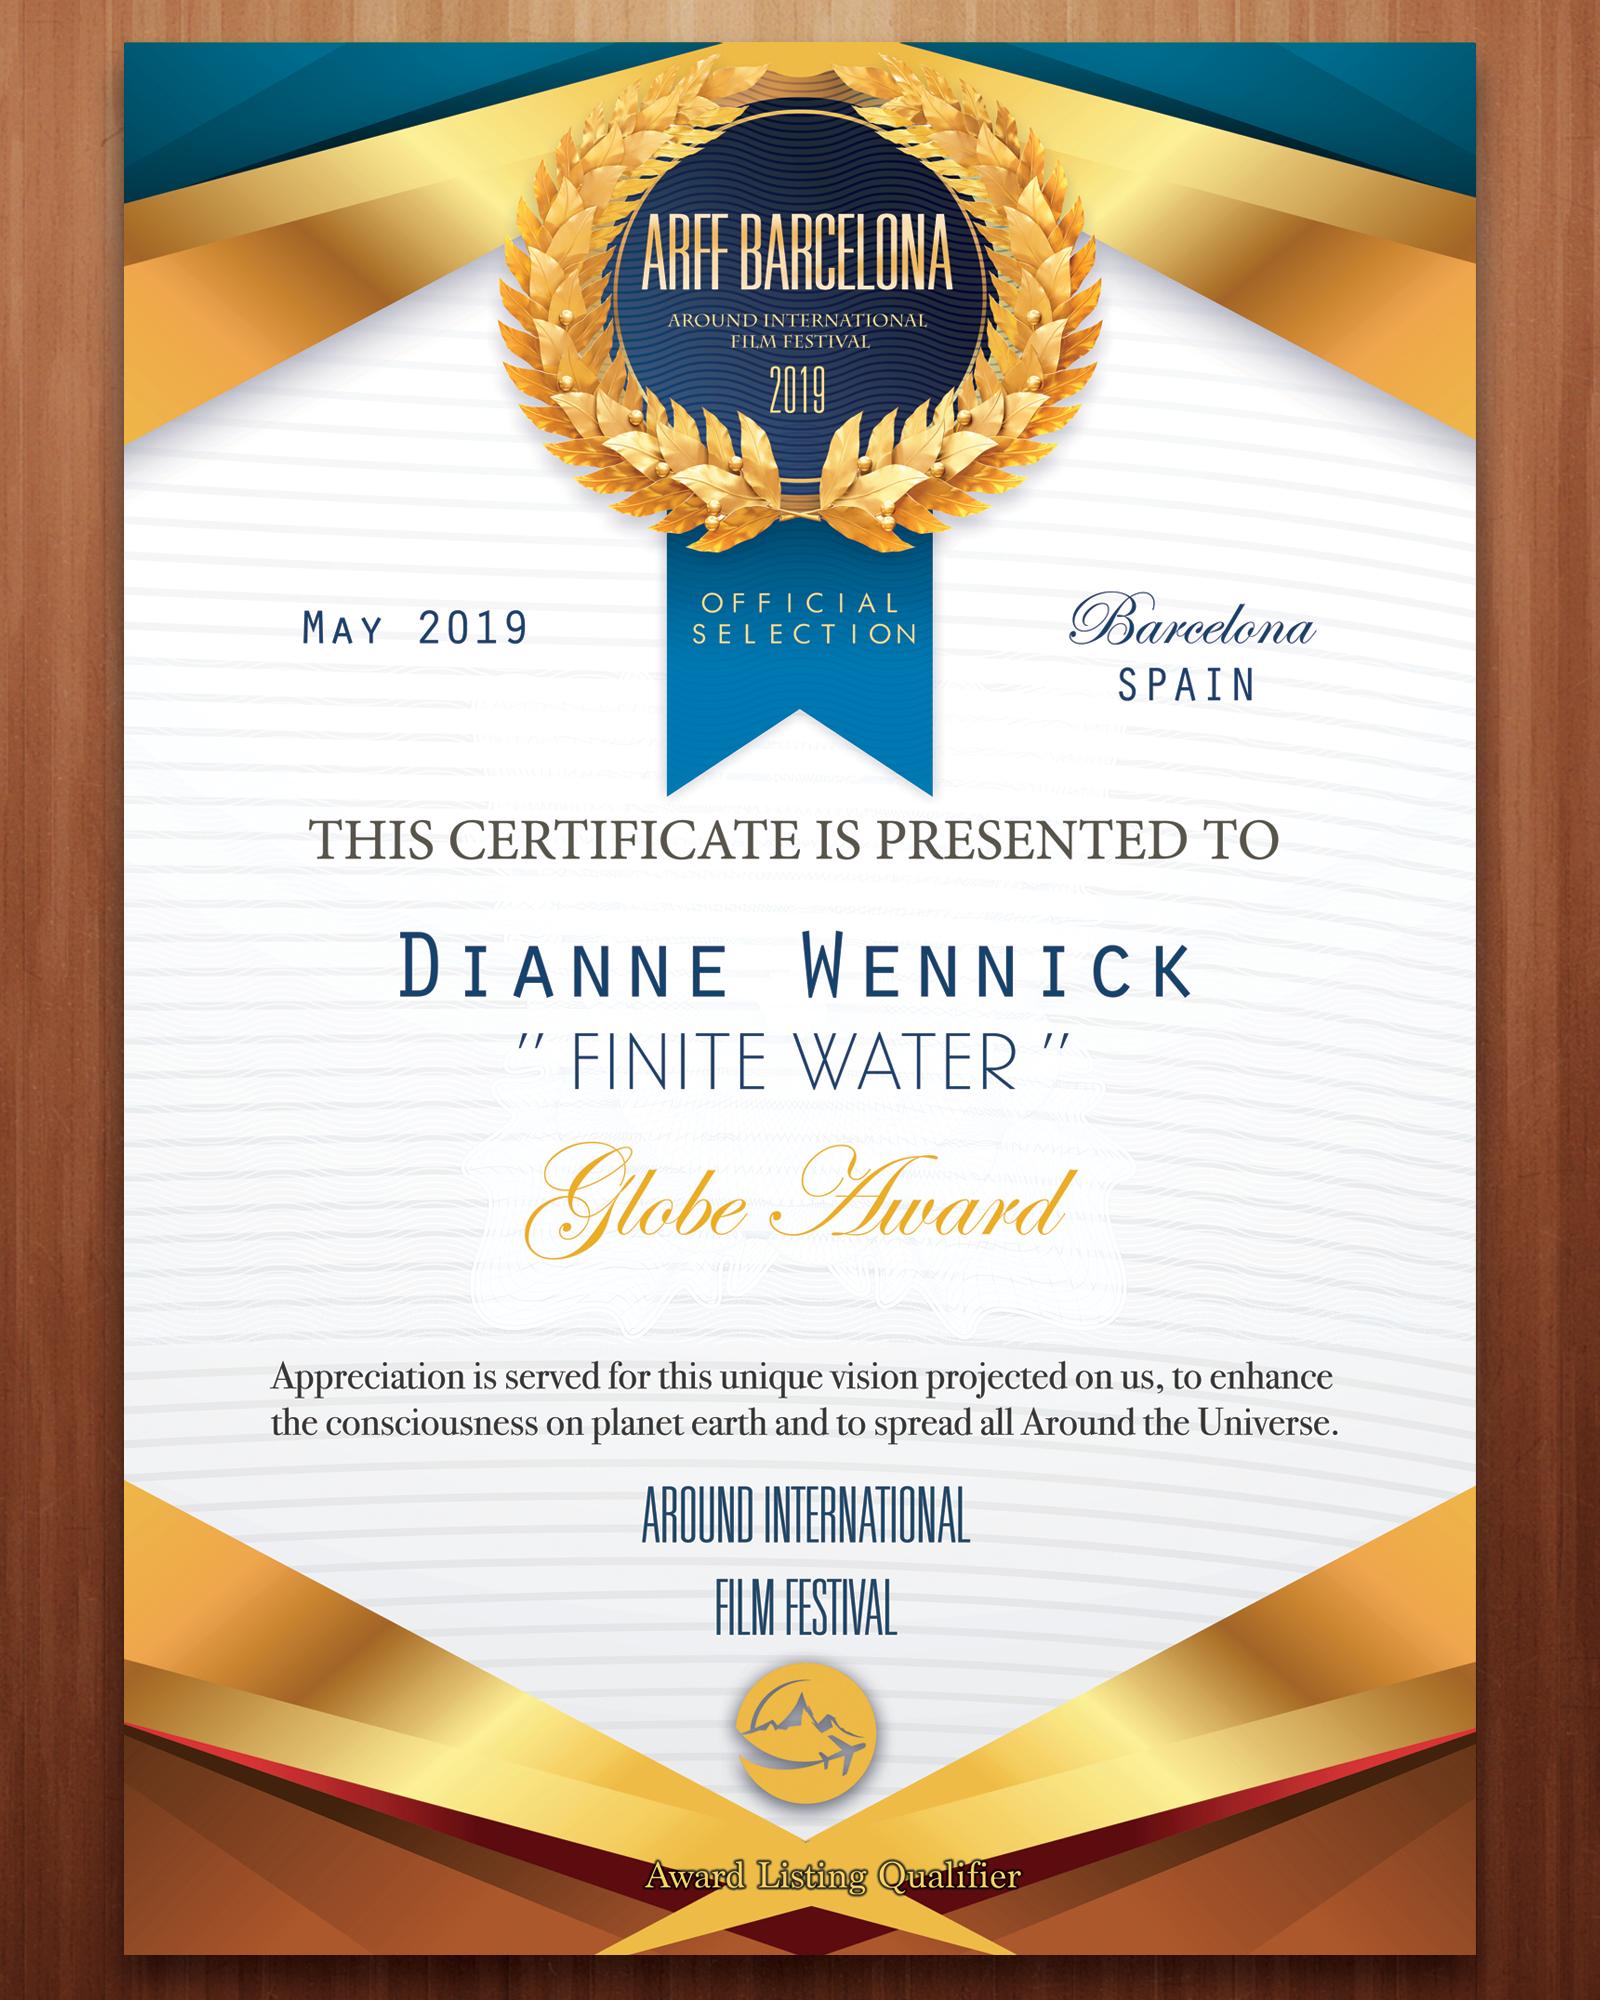 ARFF_Certificate_Finite_Water_Dianne_Wennick_2019.png